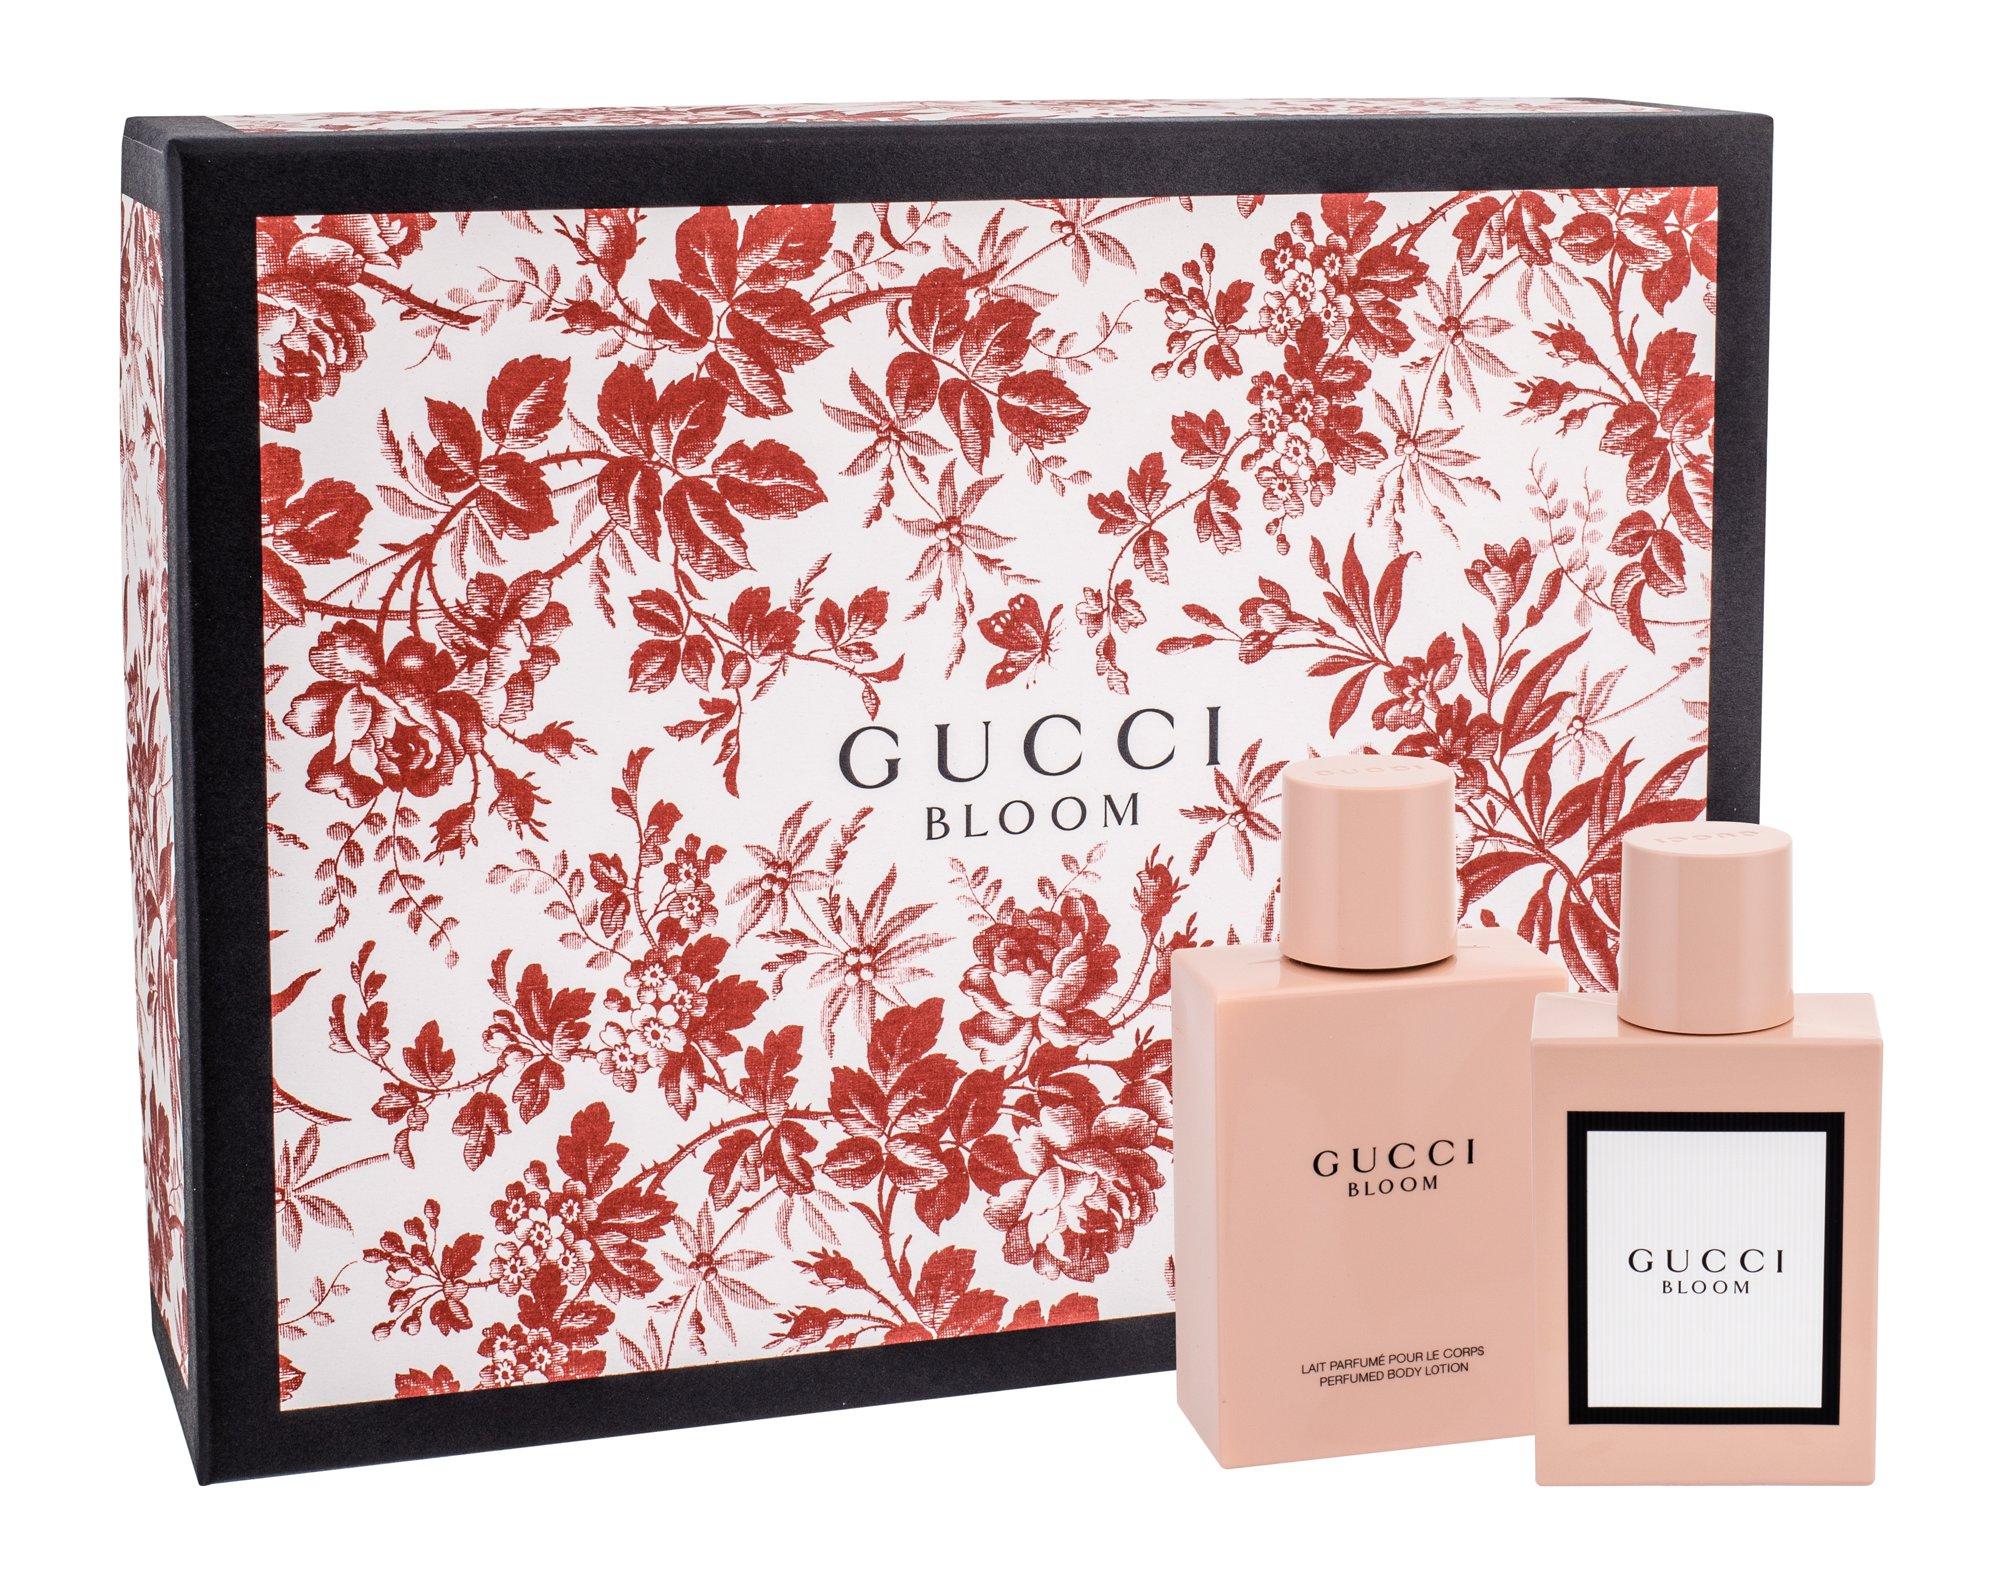 Gucci Bloom, parfumovaná voda 50 ml + telové mlieko 100 ml